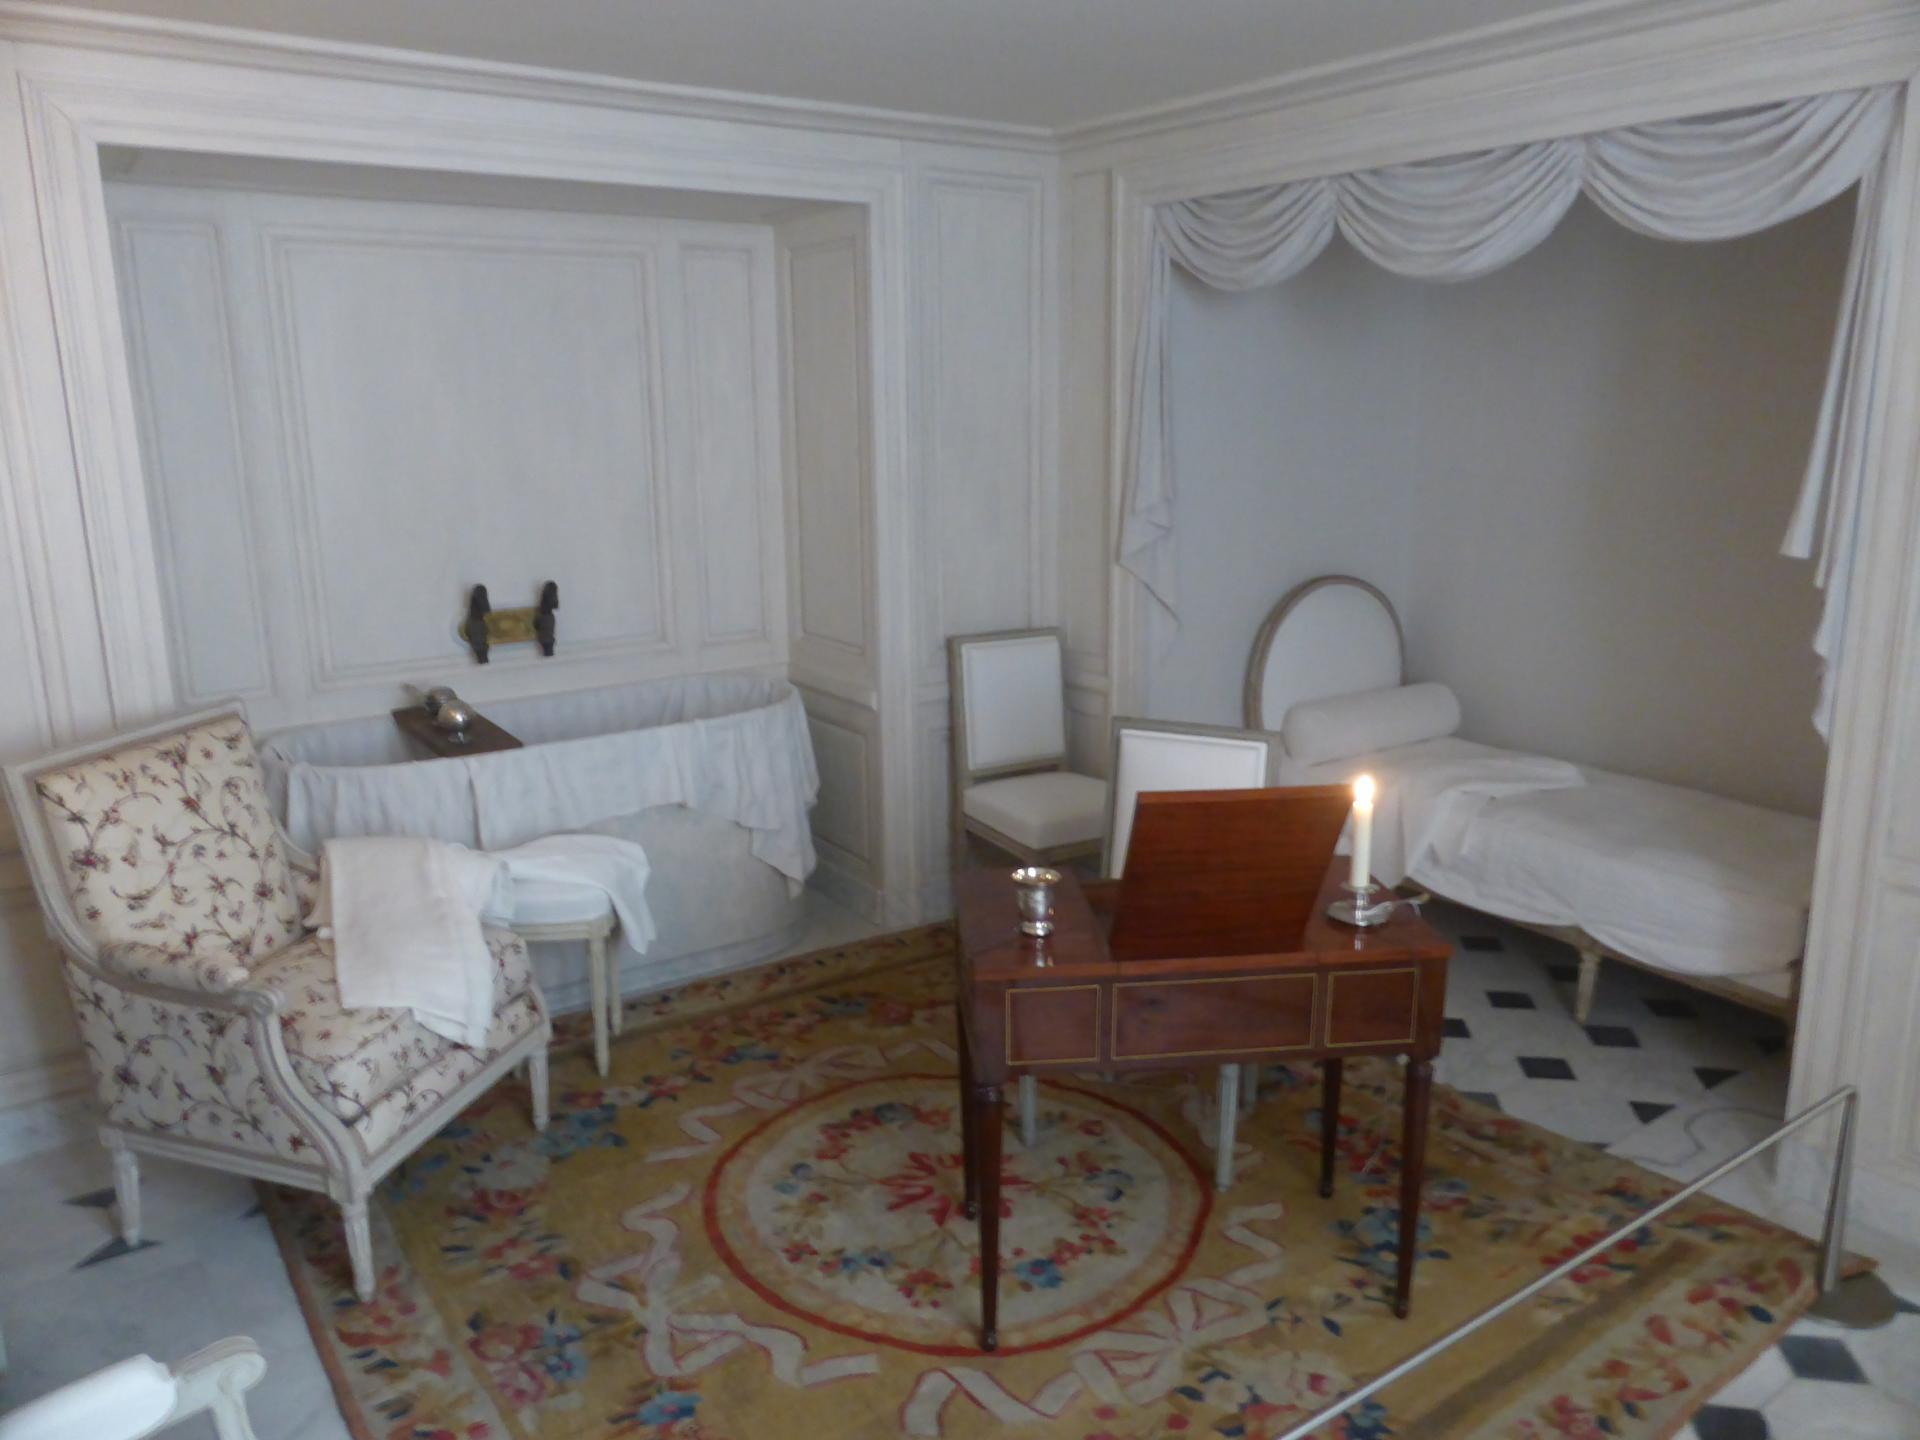 Salle de bains de Thierry de Ville d'Avray, cl. Ph. Cachau